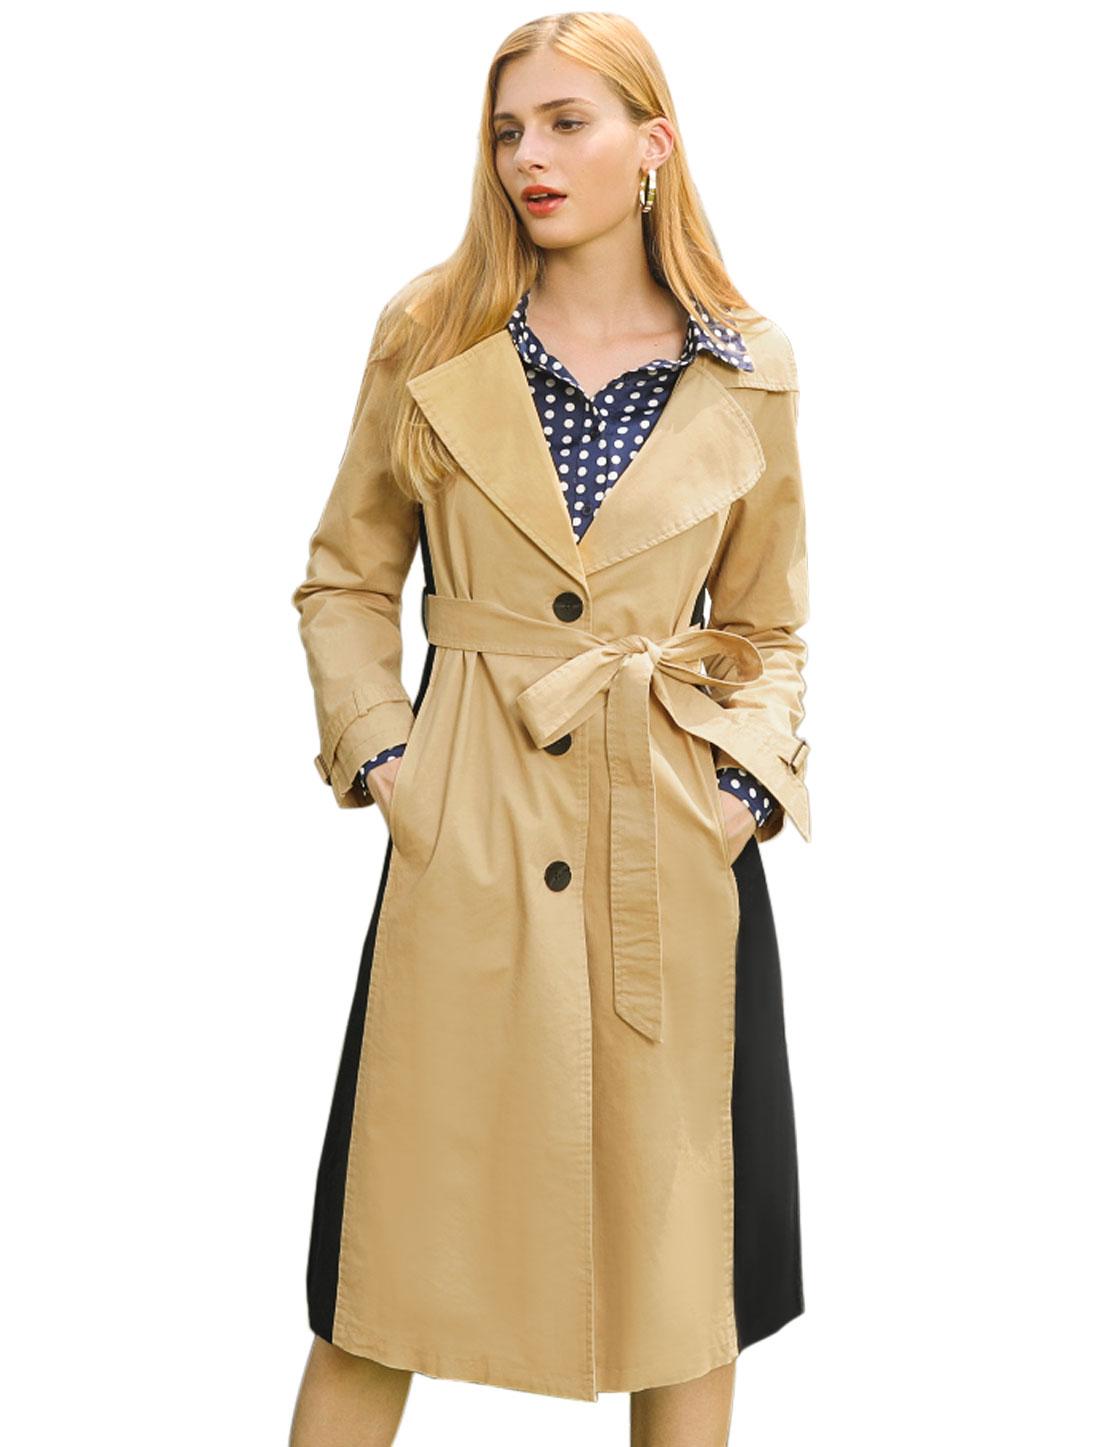 Women's Notched Lapel Long Jacket Contrast Color Belted Trench Coat Khaki L